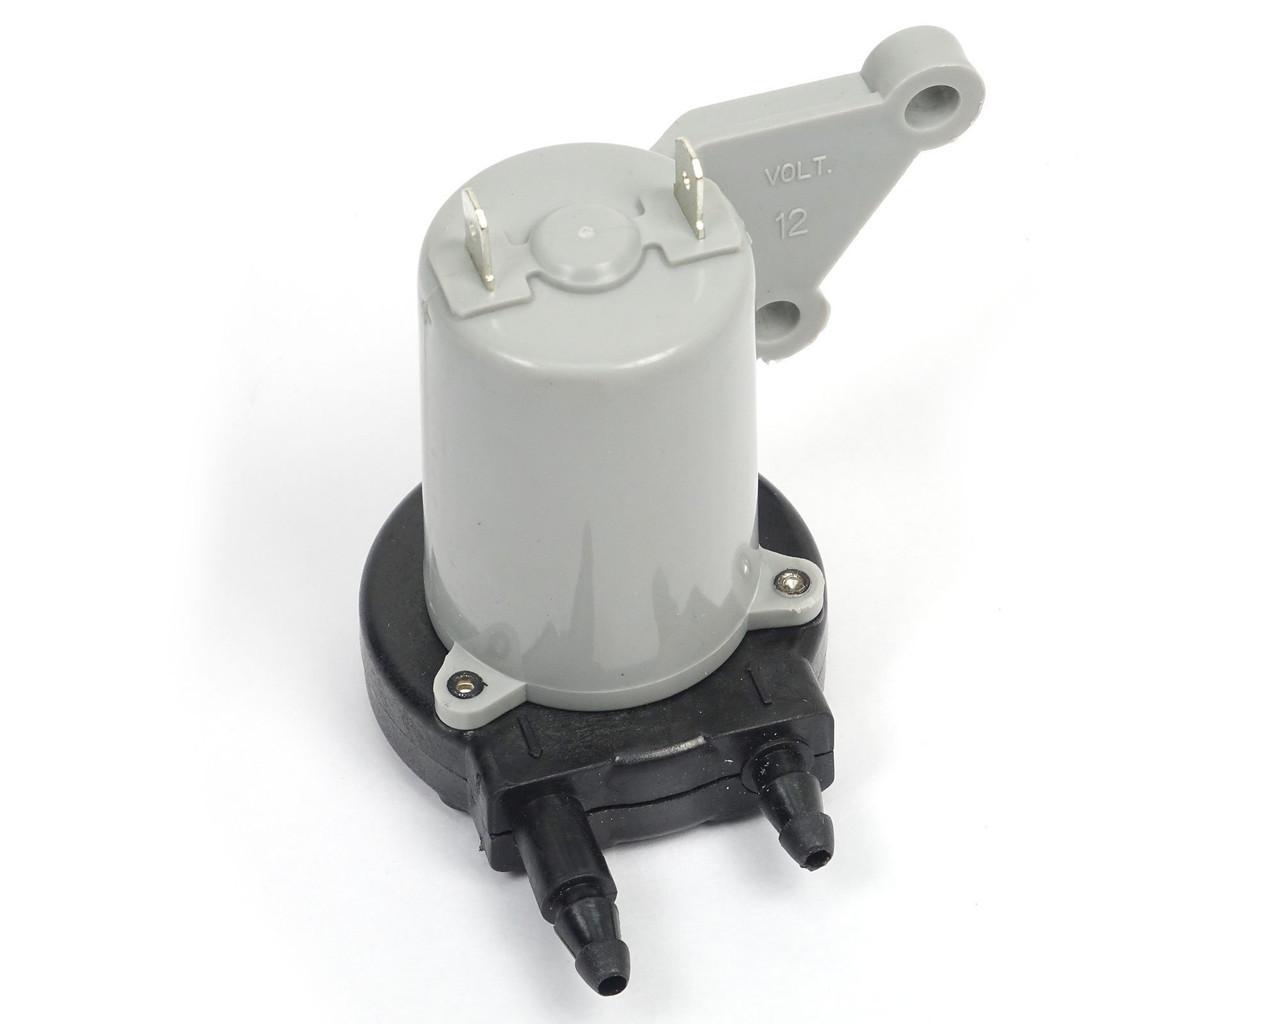 OEM Type External Washer Pump - 1970-74